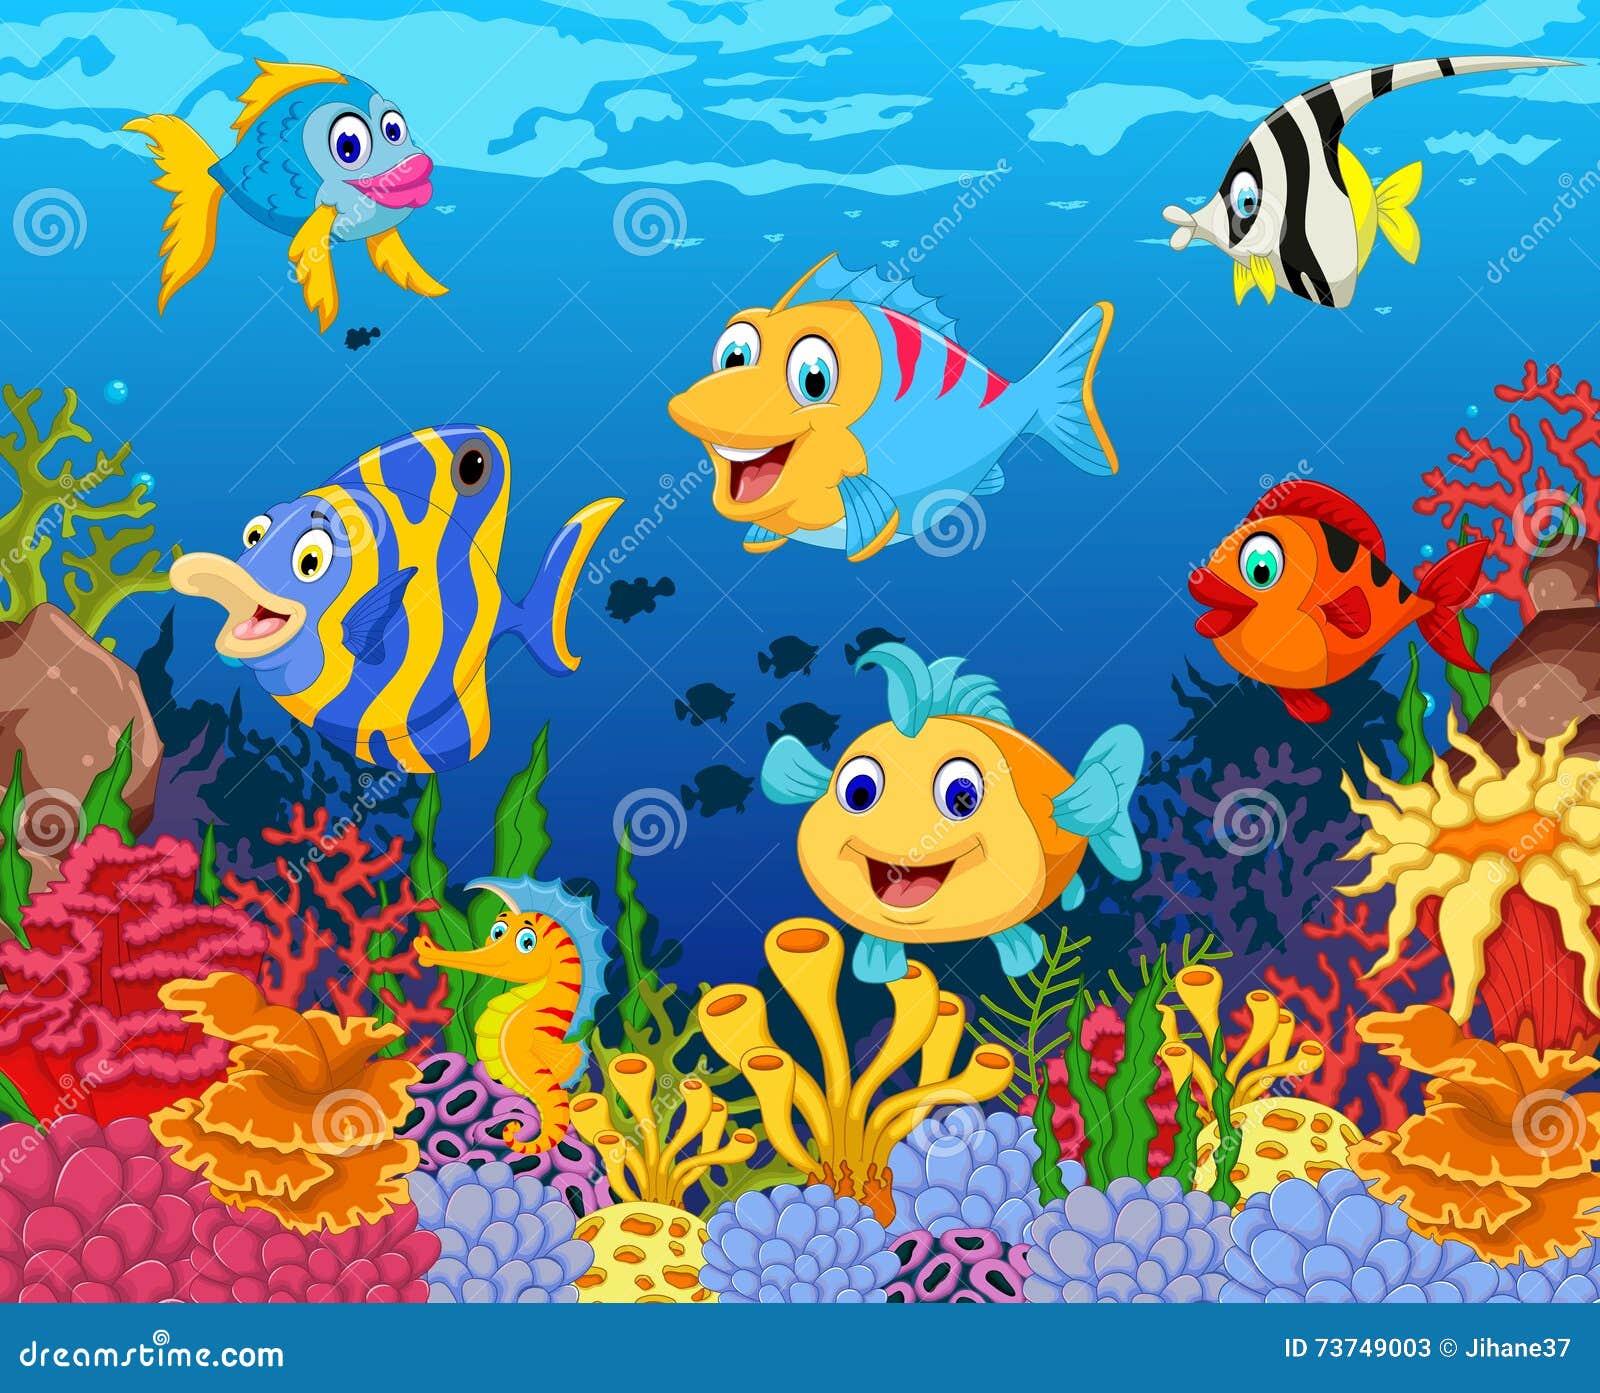 List of Sea Animals A-Z